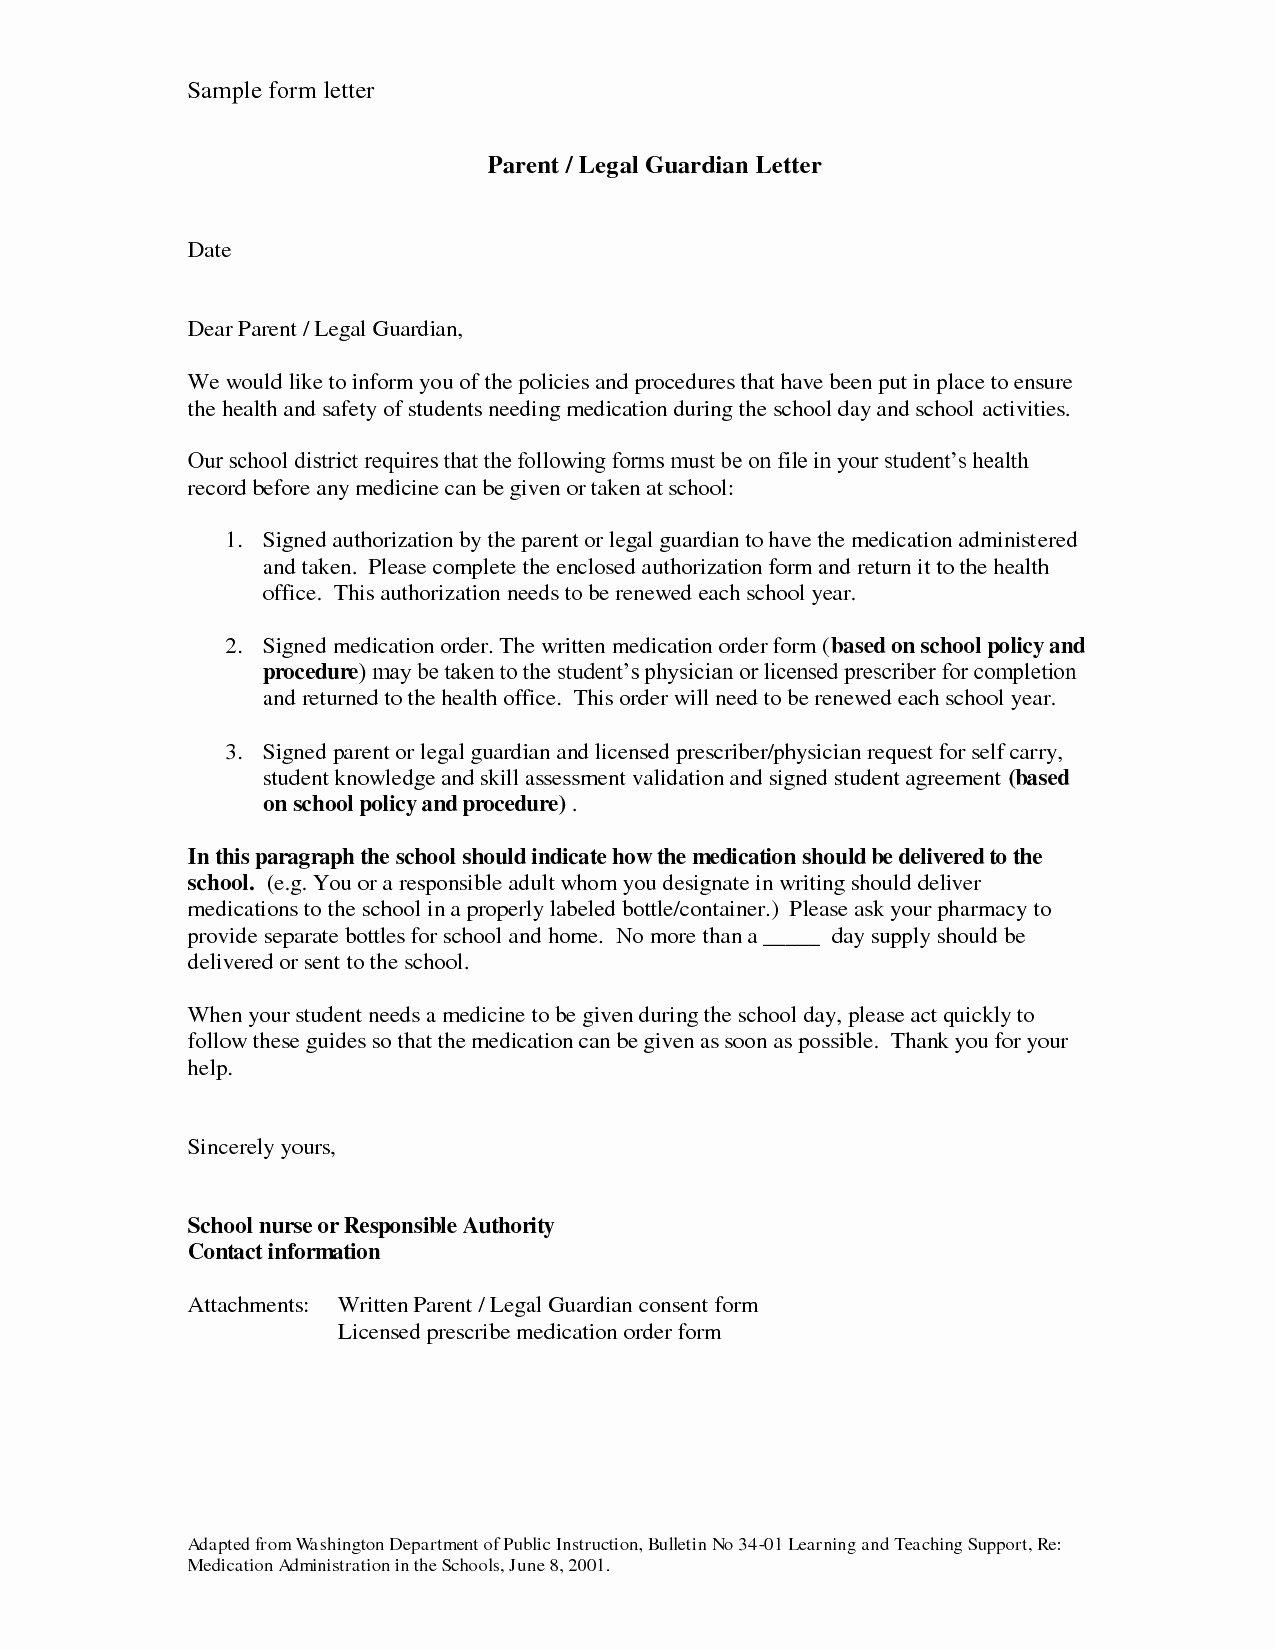 Permanent Guardianship Letter Template Elegant Permanent Guardianship Letter Template Cv Templates 15